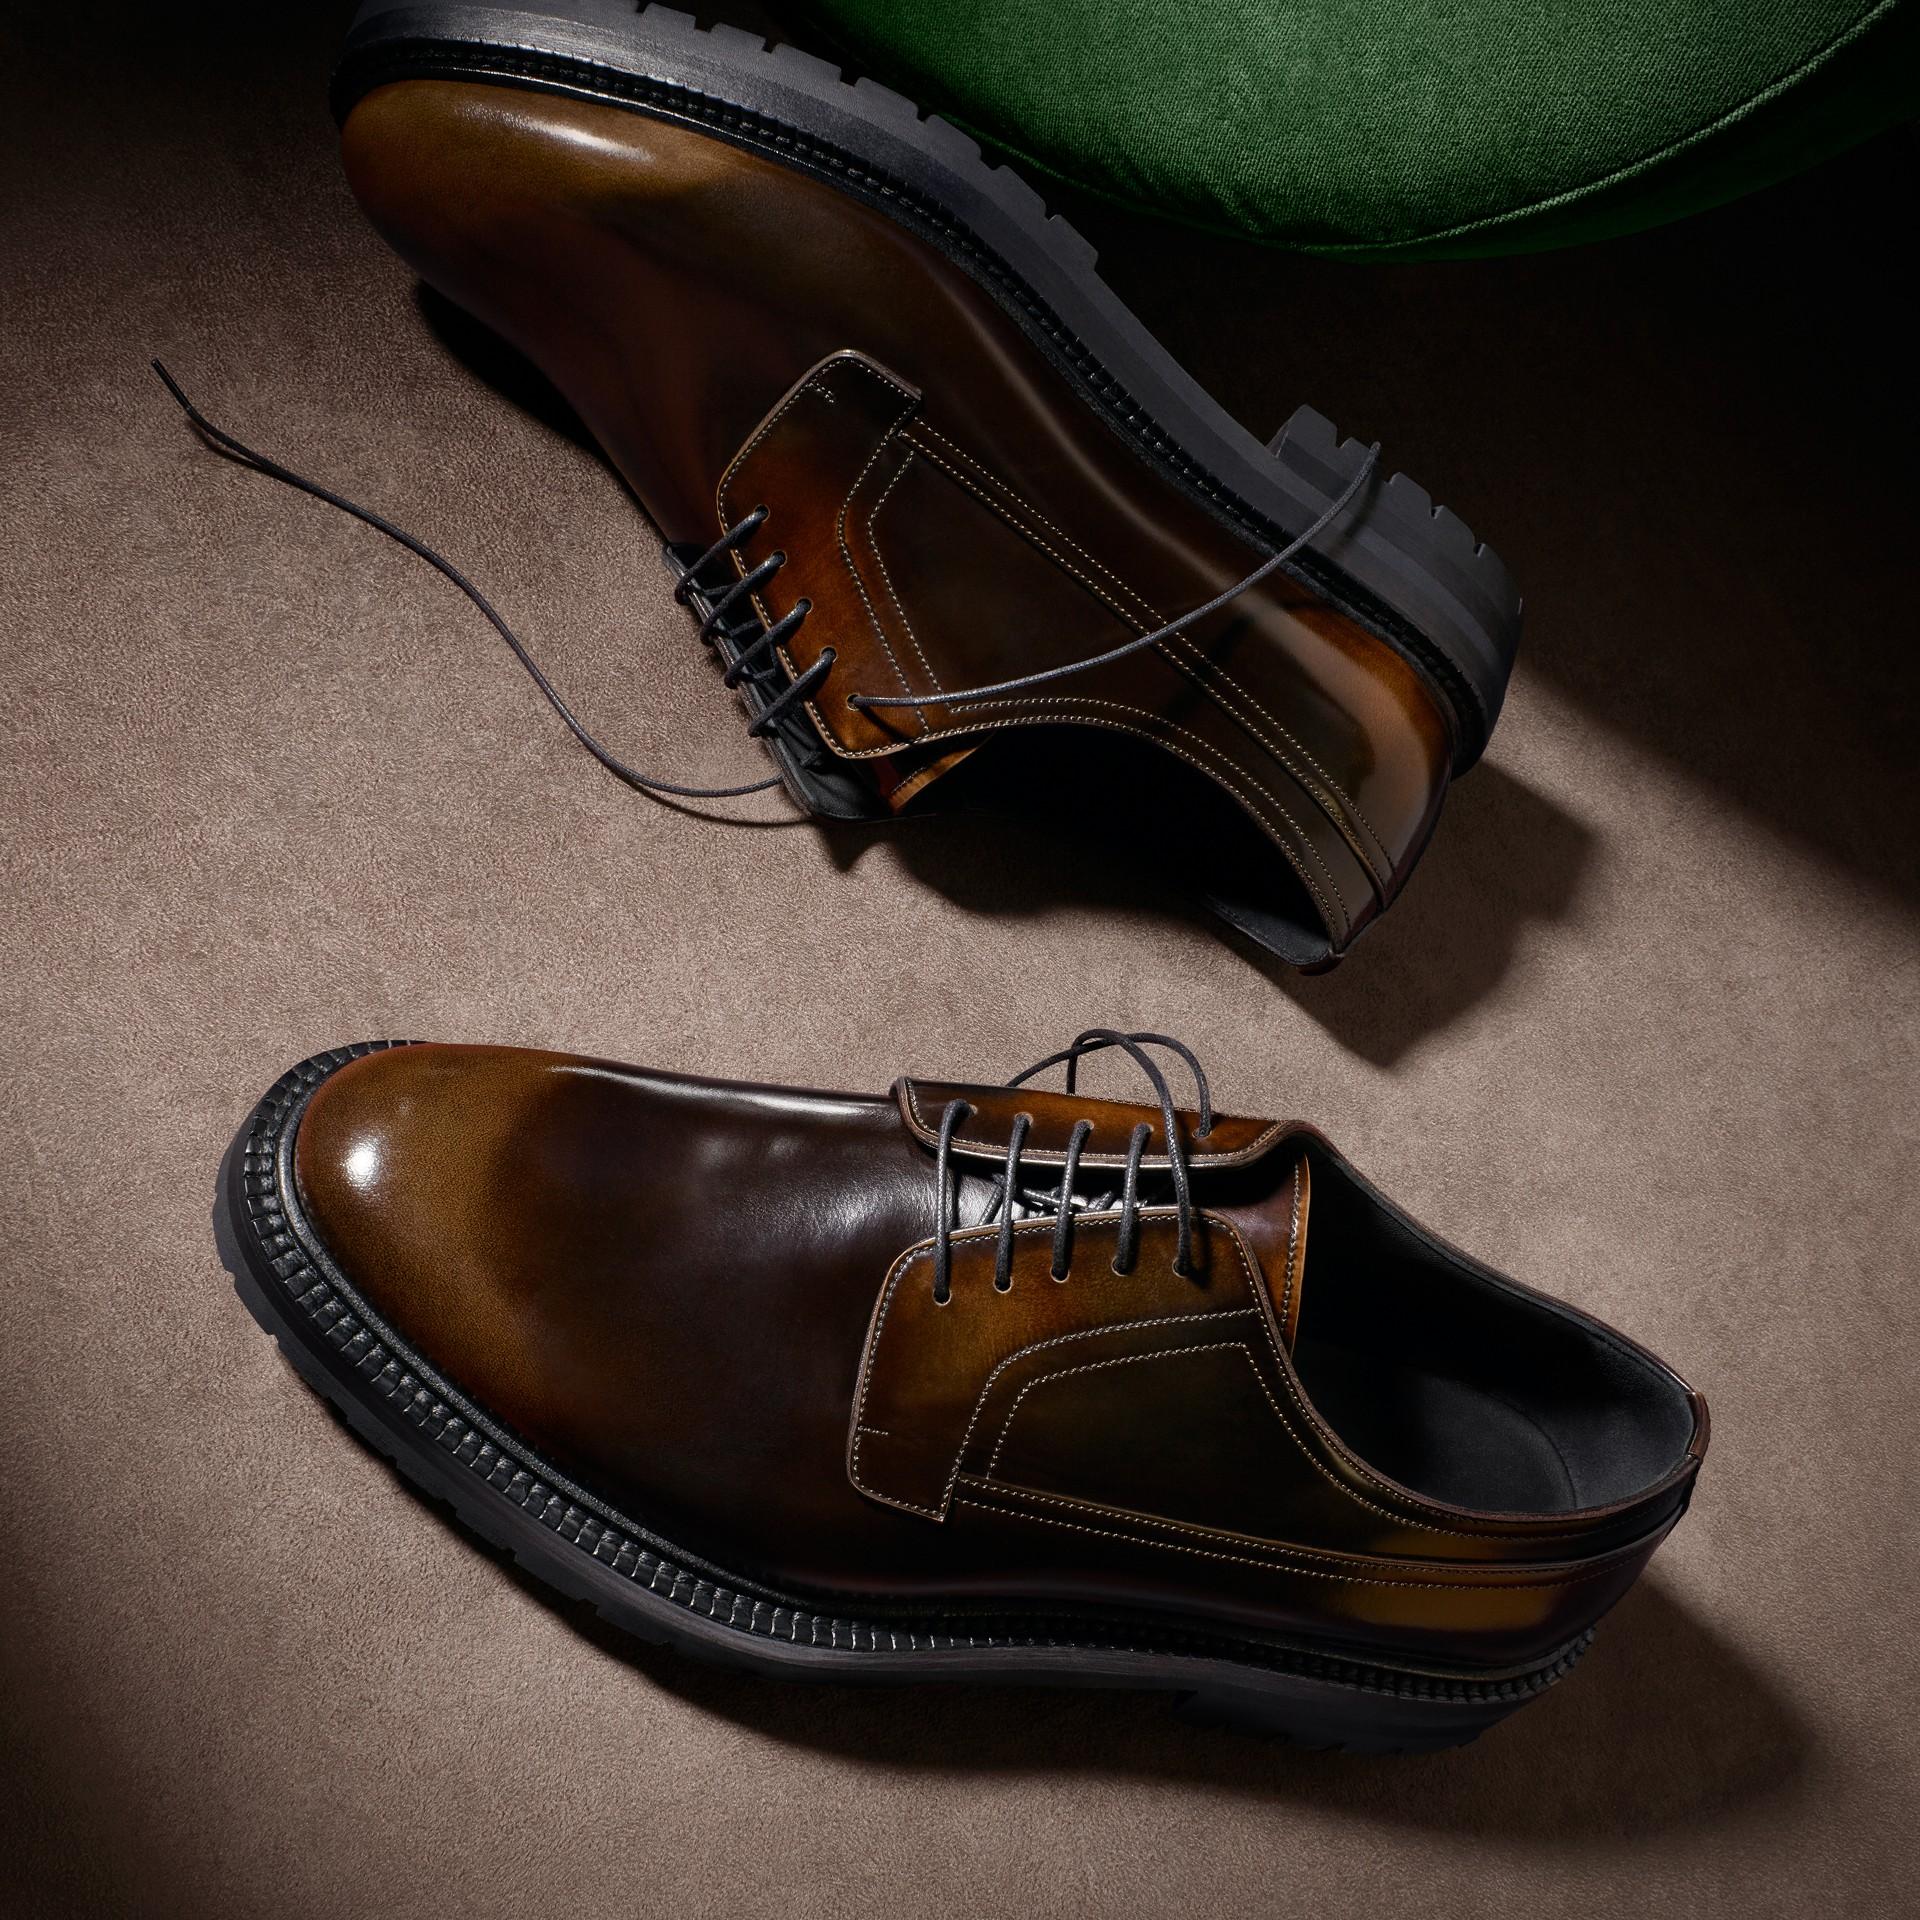 Chocolat amer Chaussures de style derby en cuir bruni Chocolat Amer - photo de la galerie 6